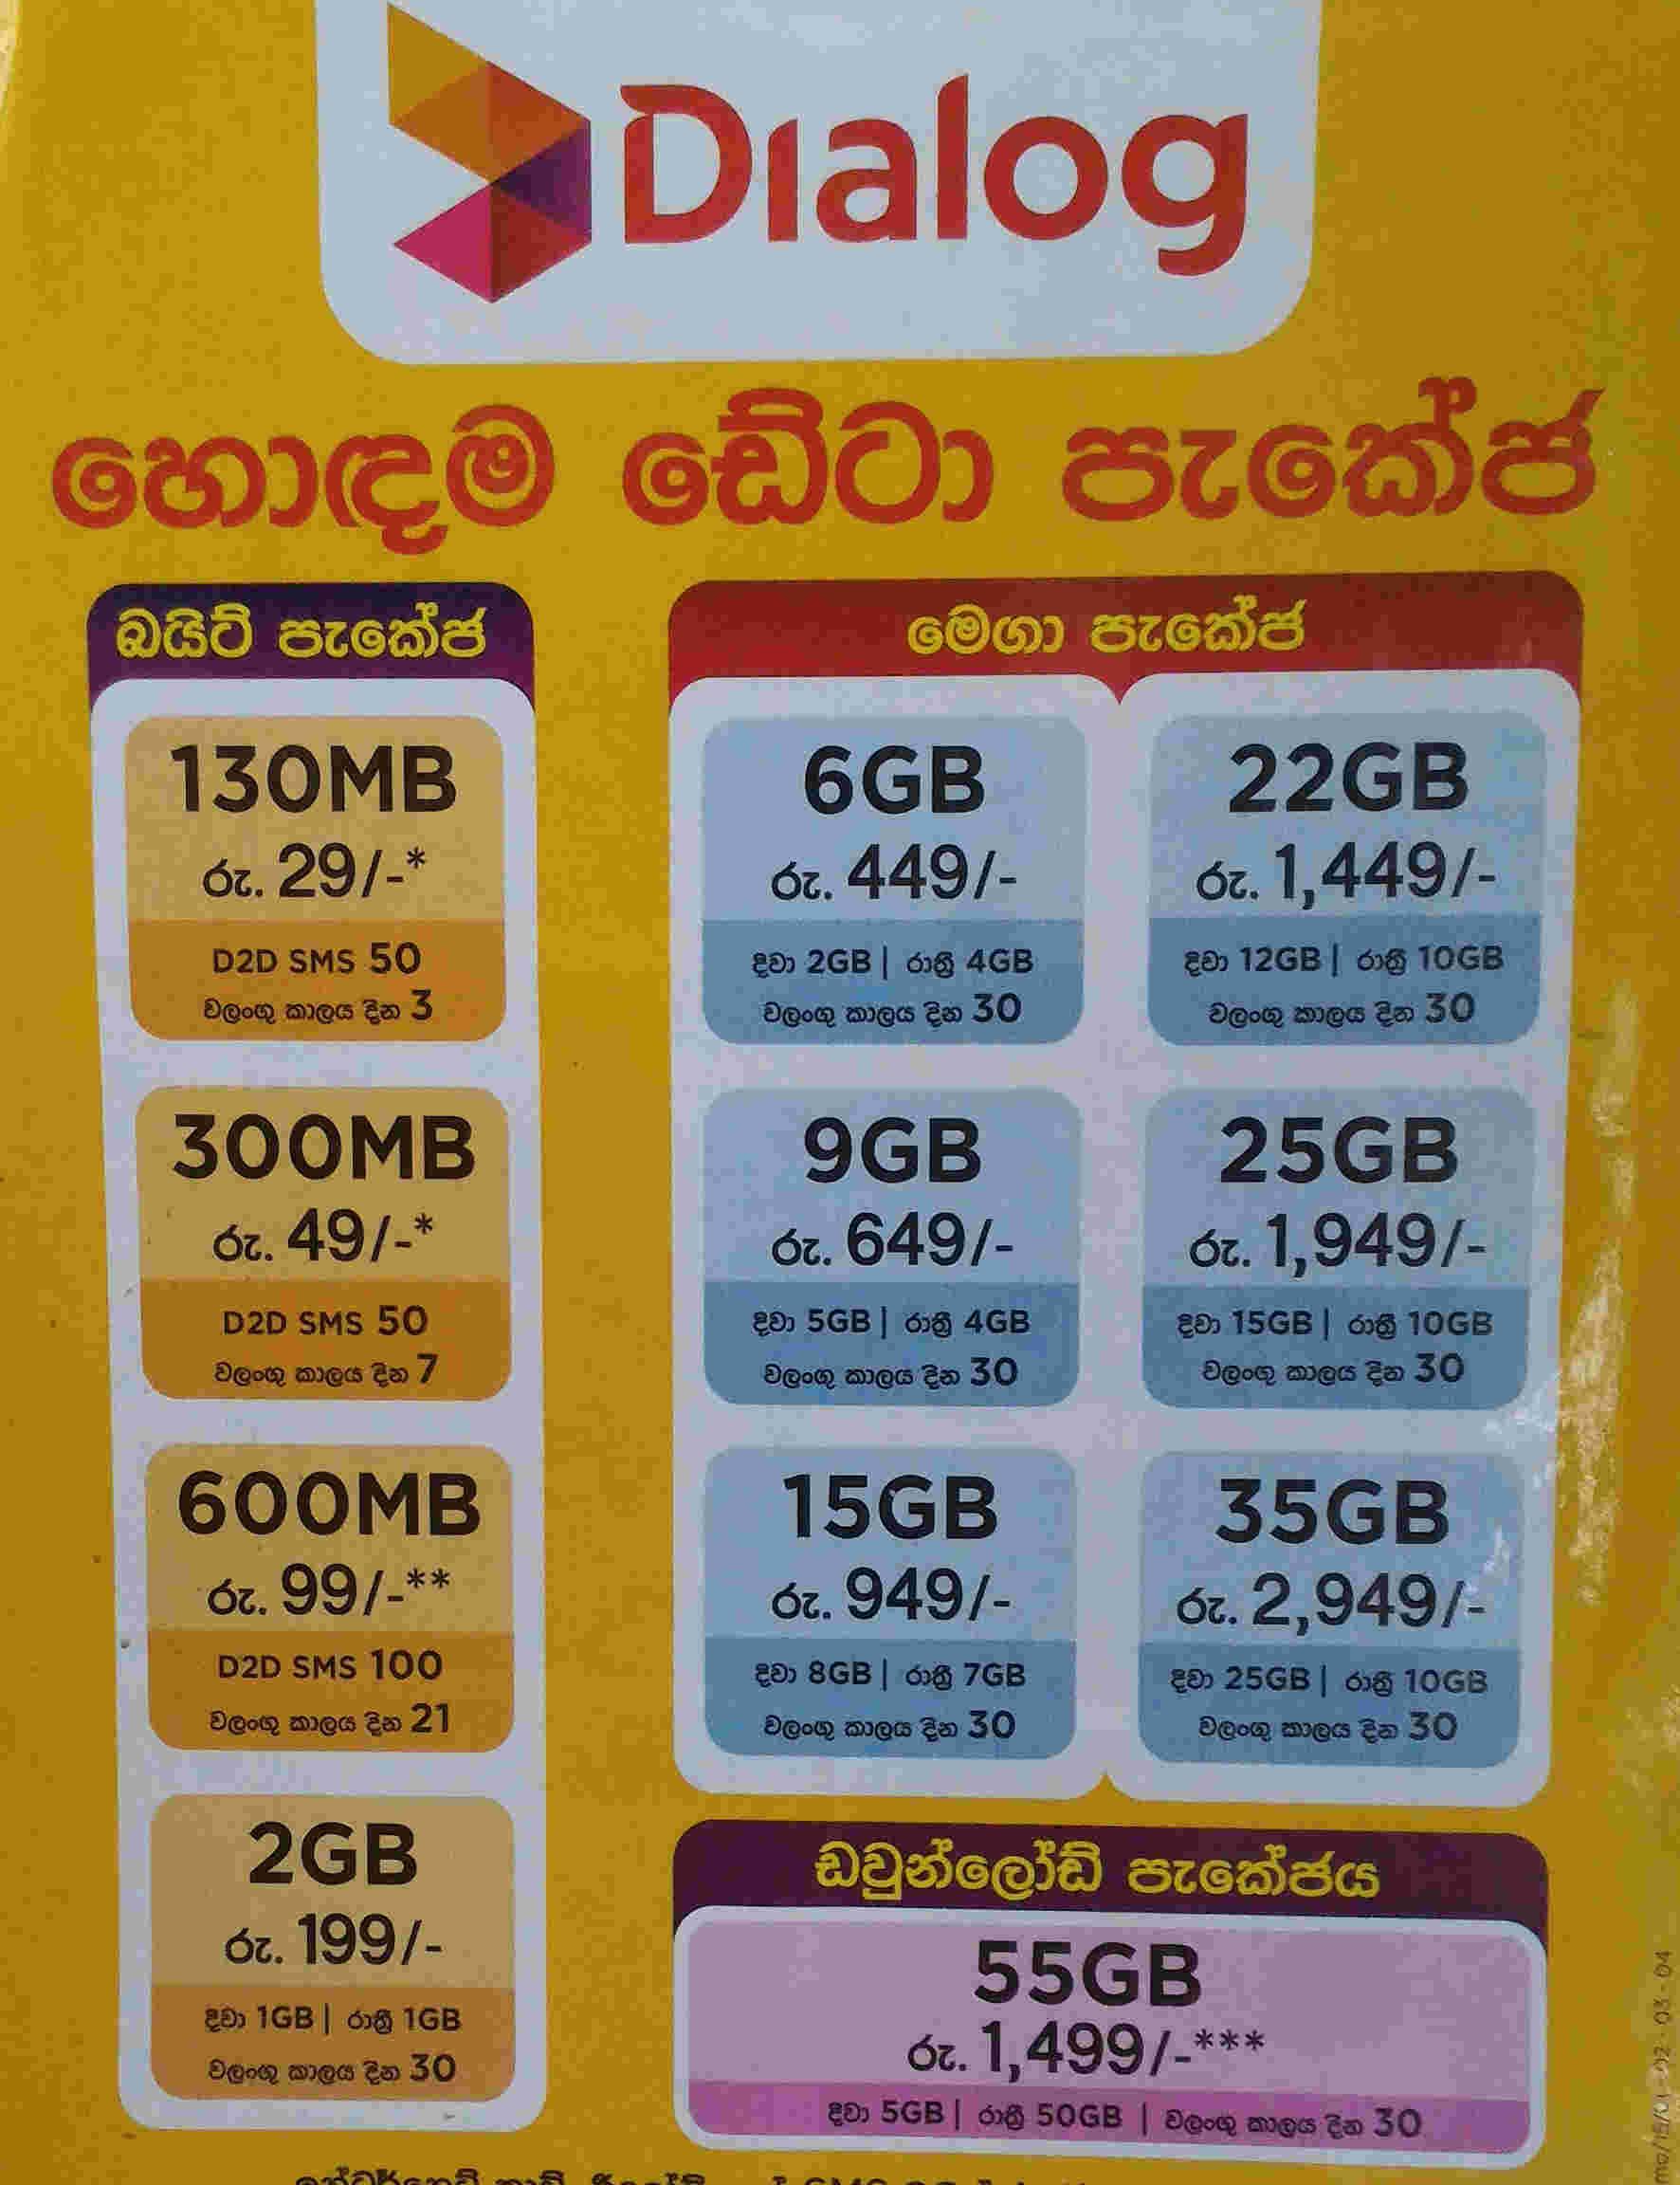 Интернет в Шри-Ланке (Коломбо, Канди) 2015